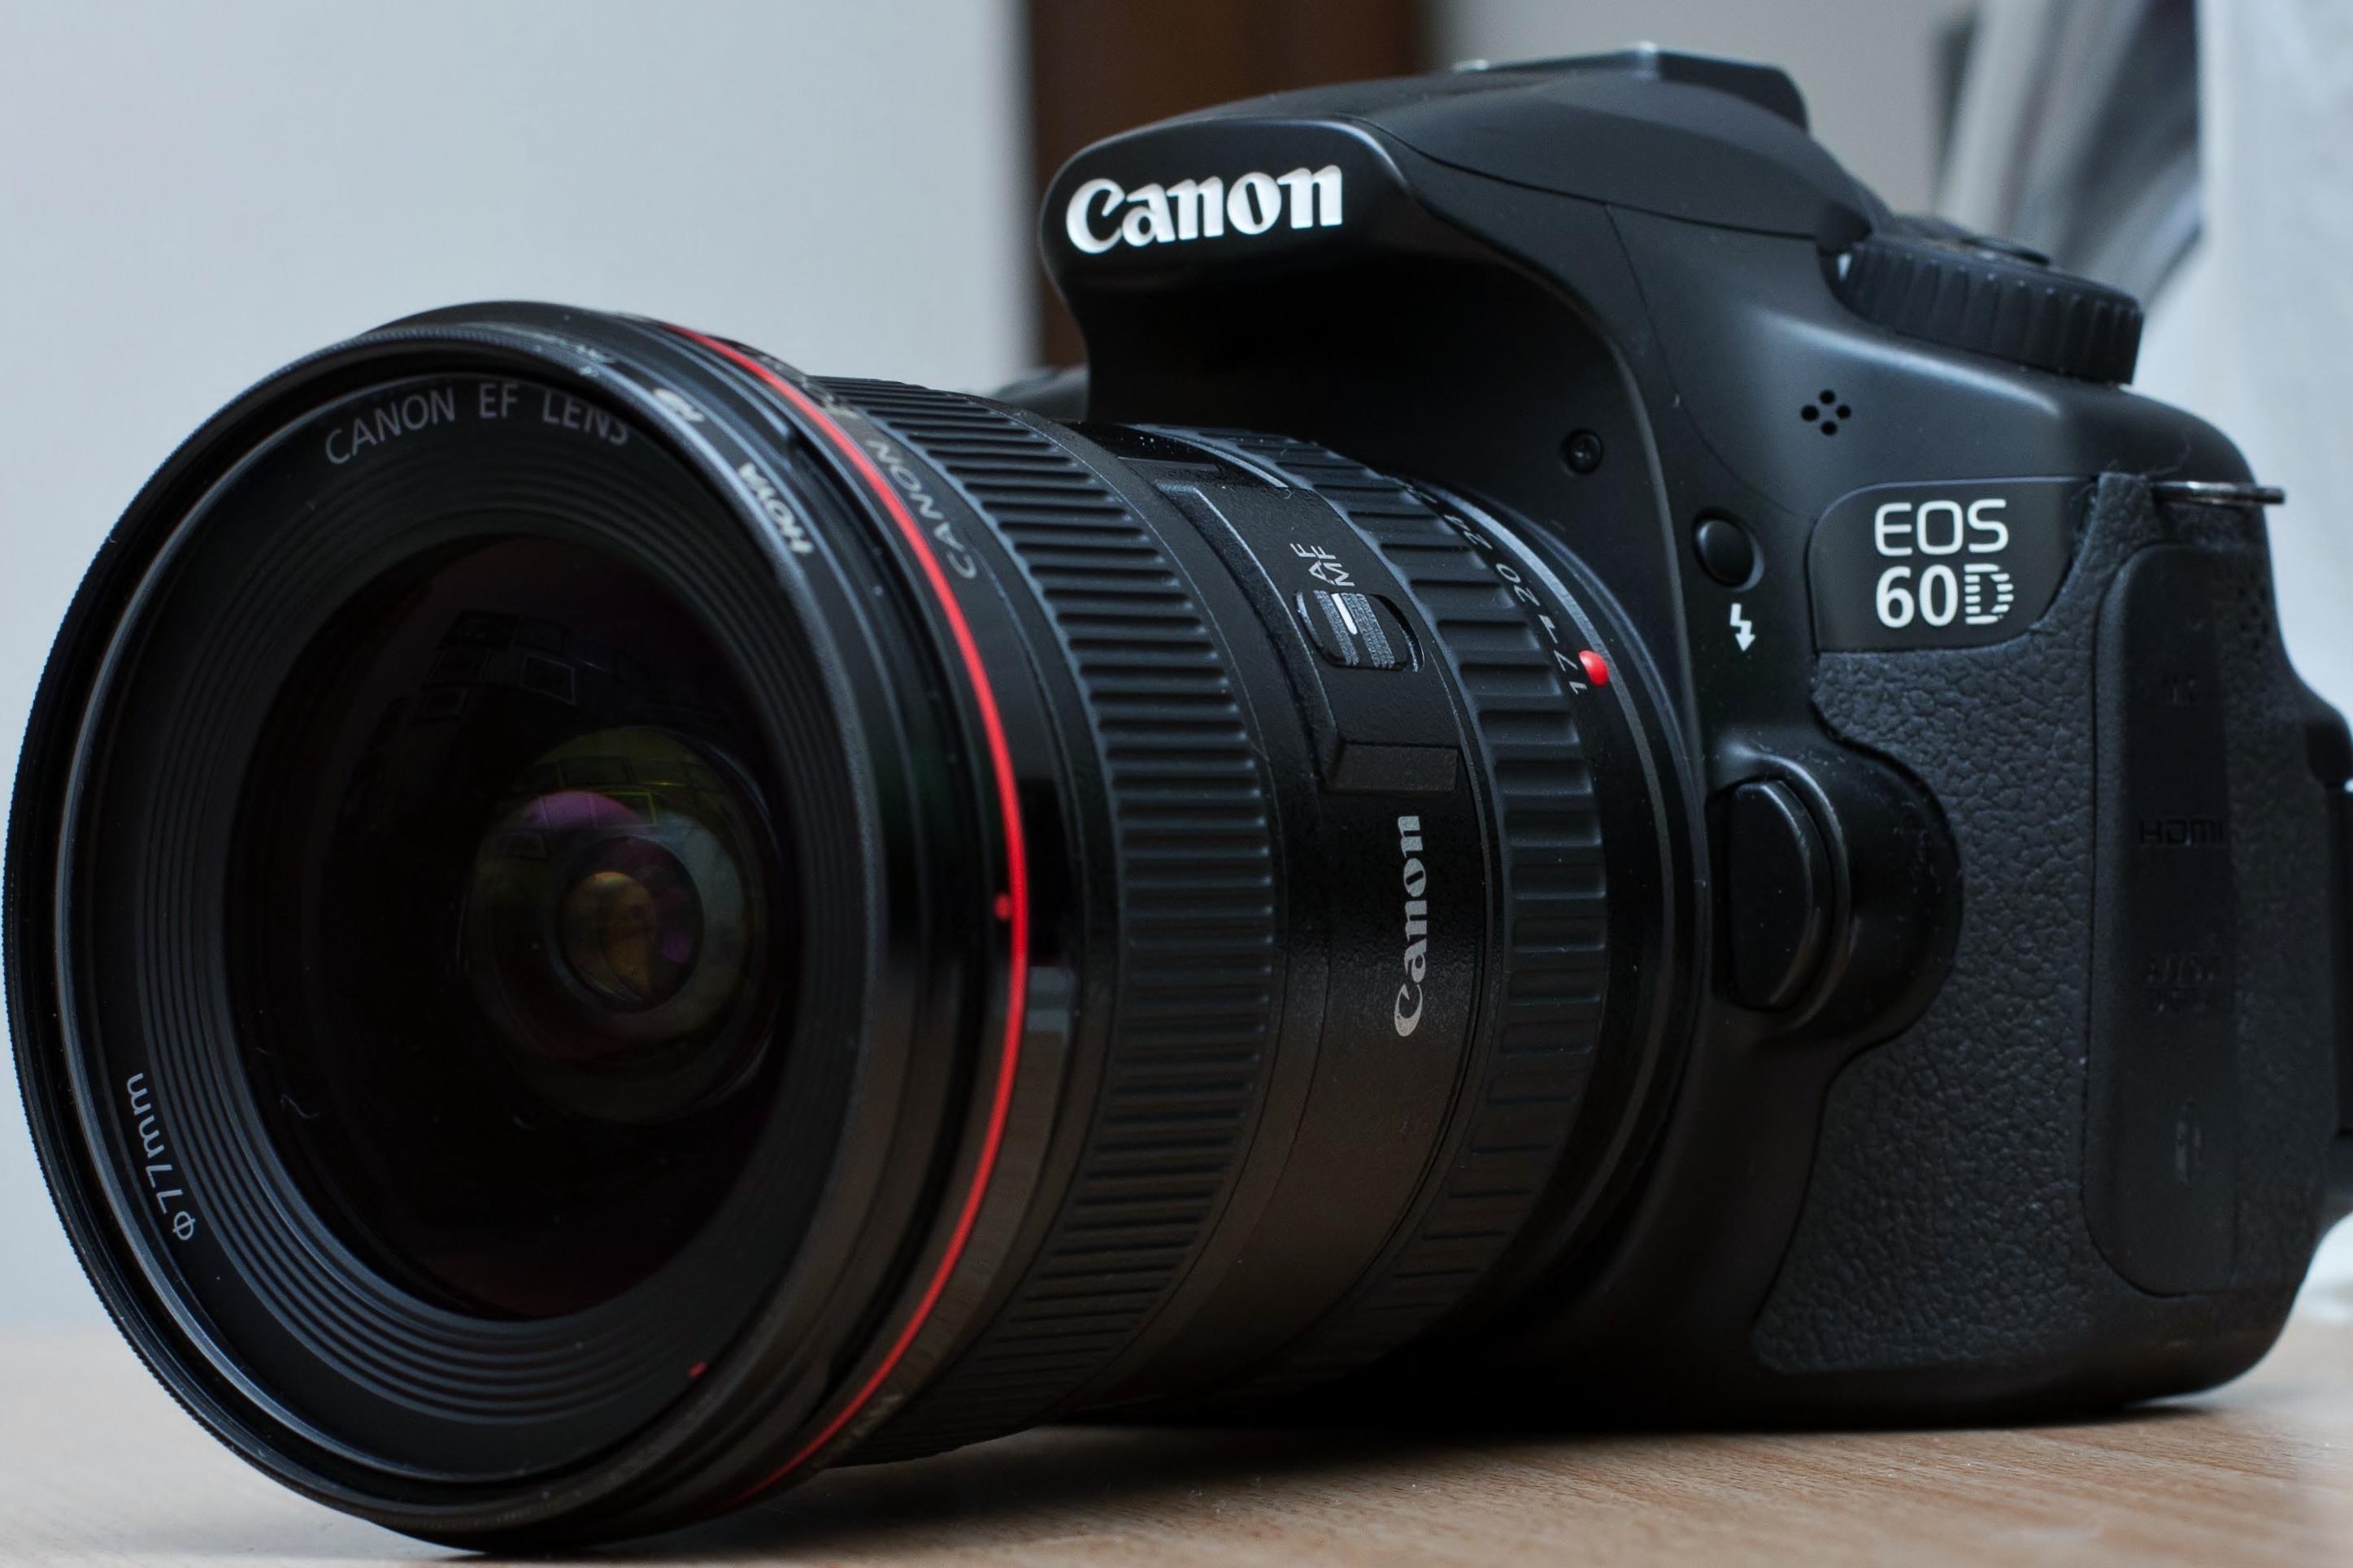 Camera Canon Dslr Camera 60d filecanon eos 60d jpg wikimedia commons jpg